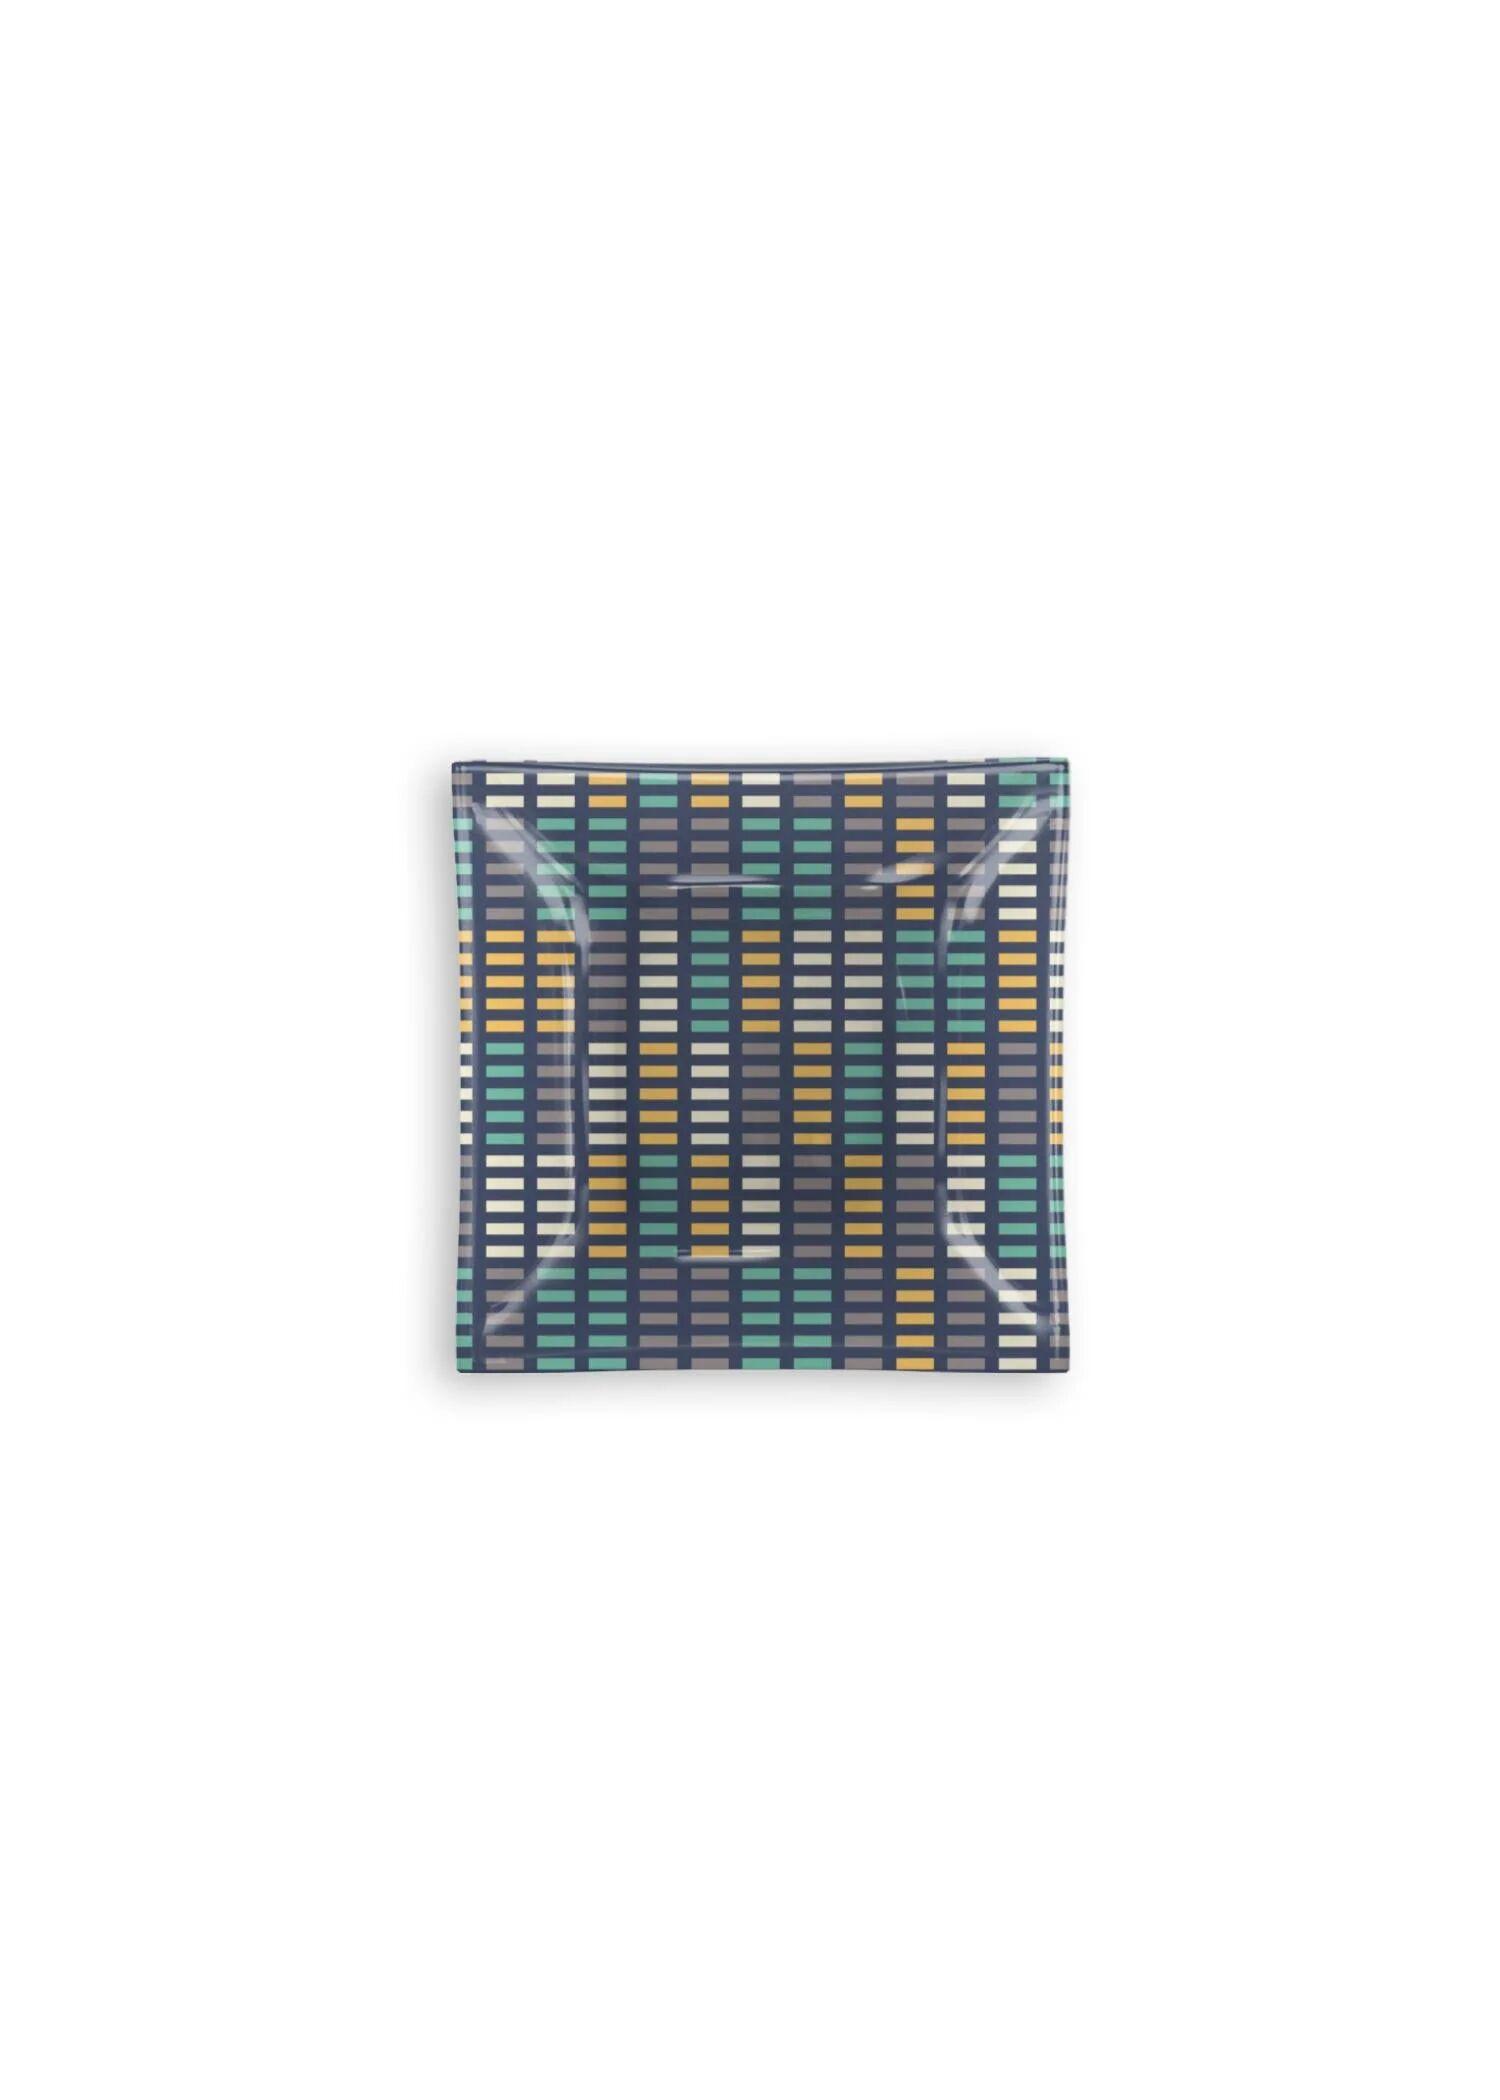 VIDA Square Glass Tray - Music Equalizer by VIDA Original Artist  - Size: Large